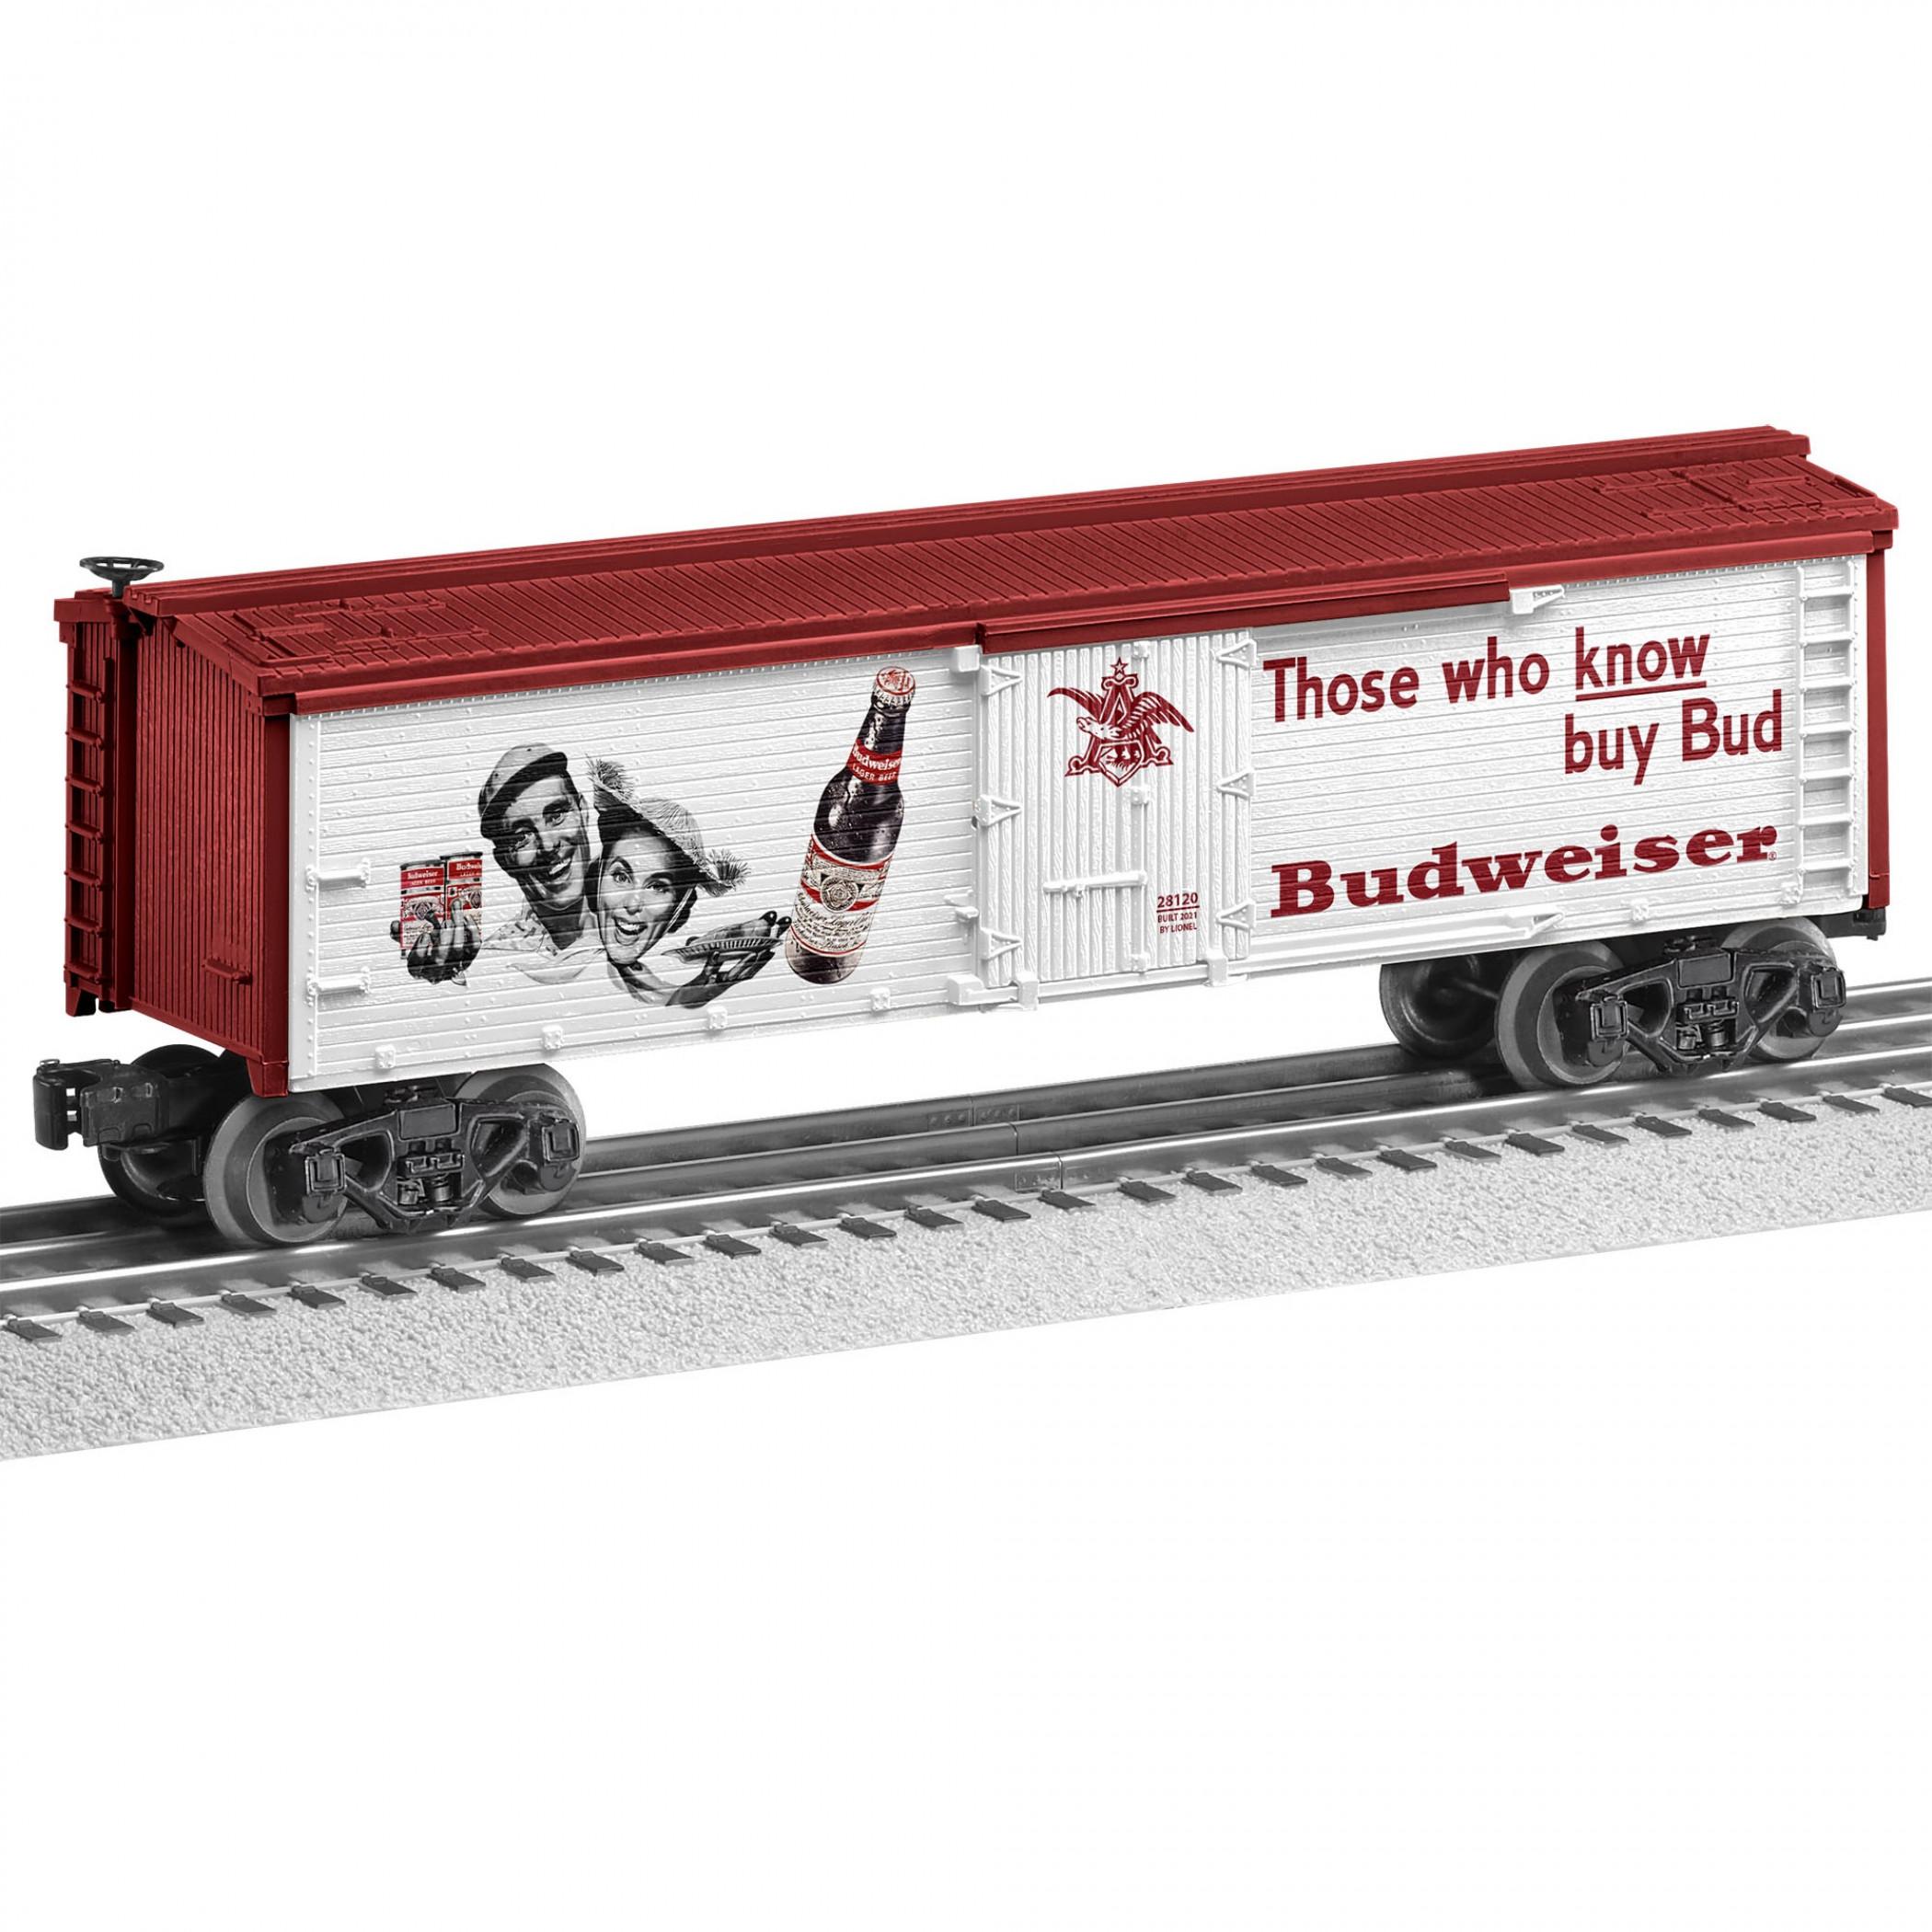 Budweiser Beer Those Who Know Train Set Train Car